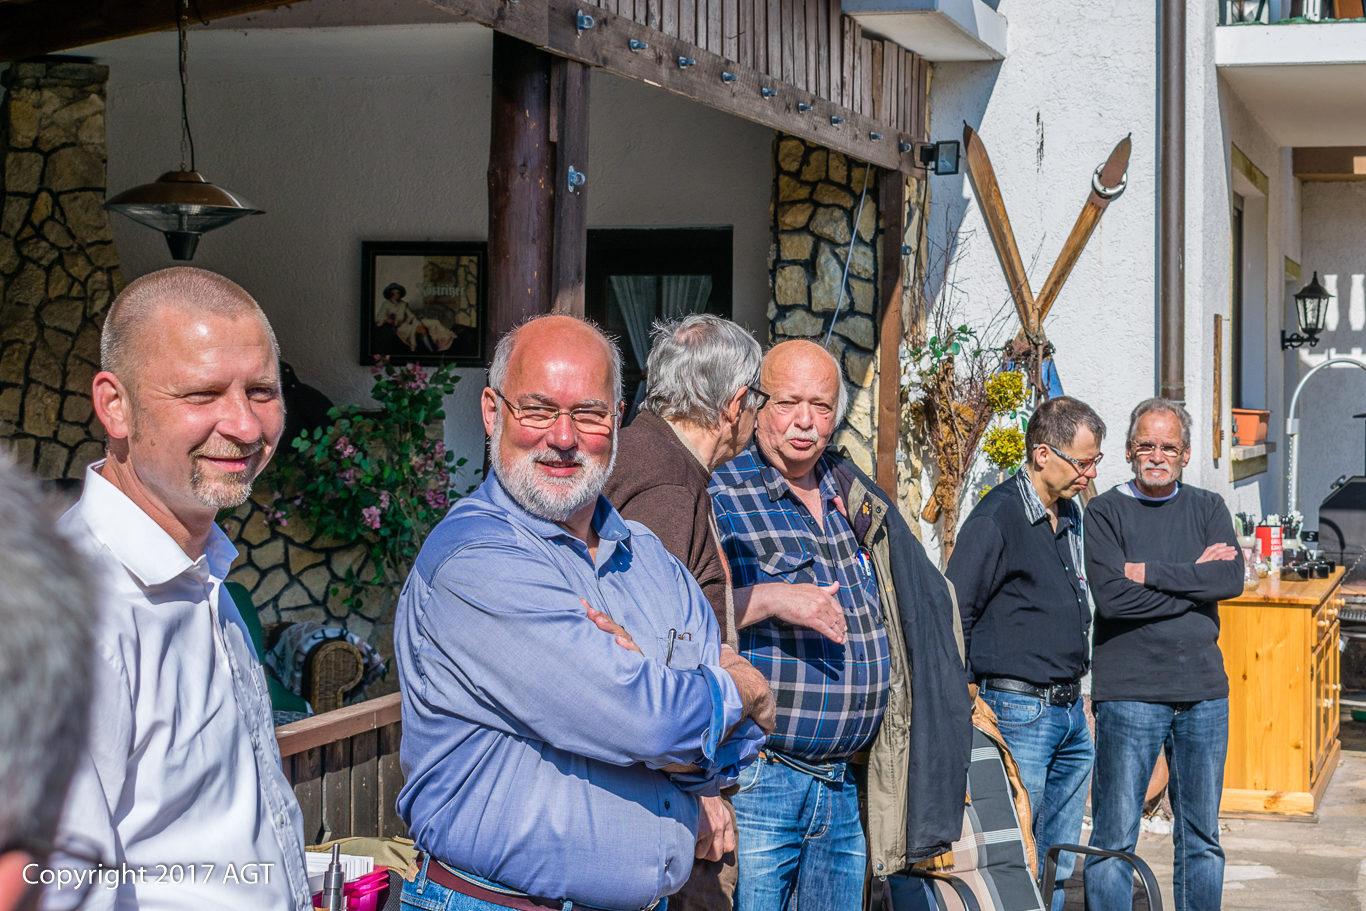 AGT, Hannfried Rötsch, JHV, Schmalkalden, Silko Ronczka